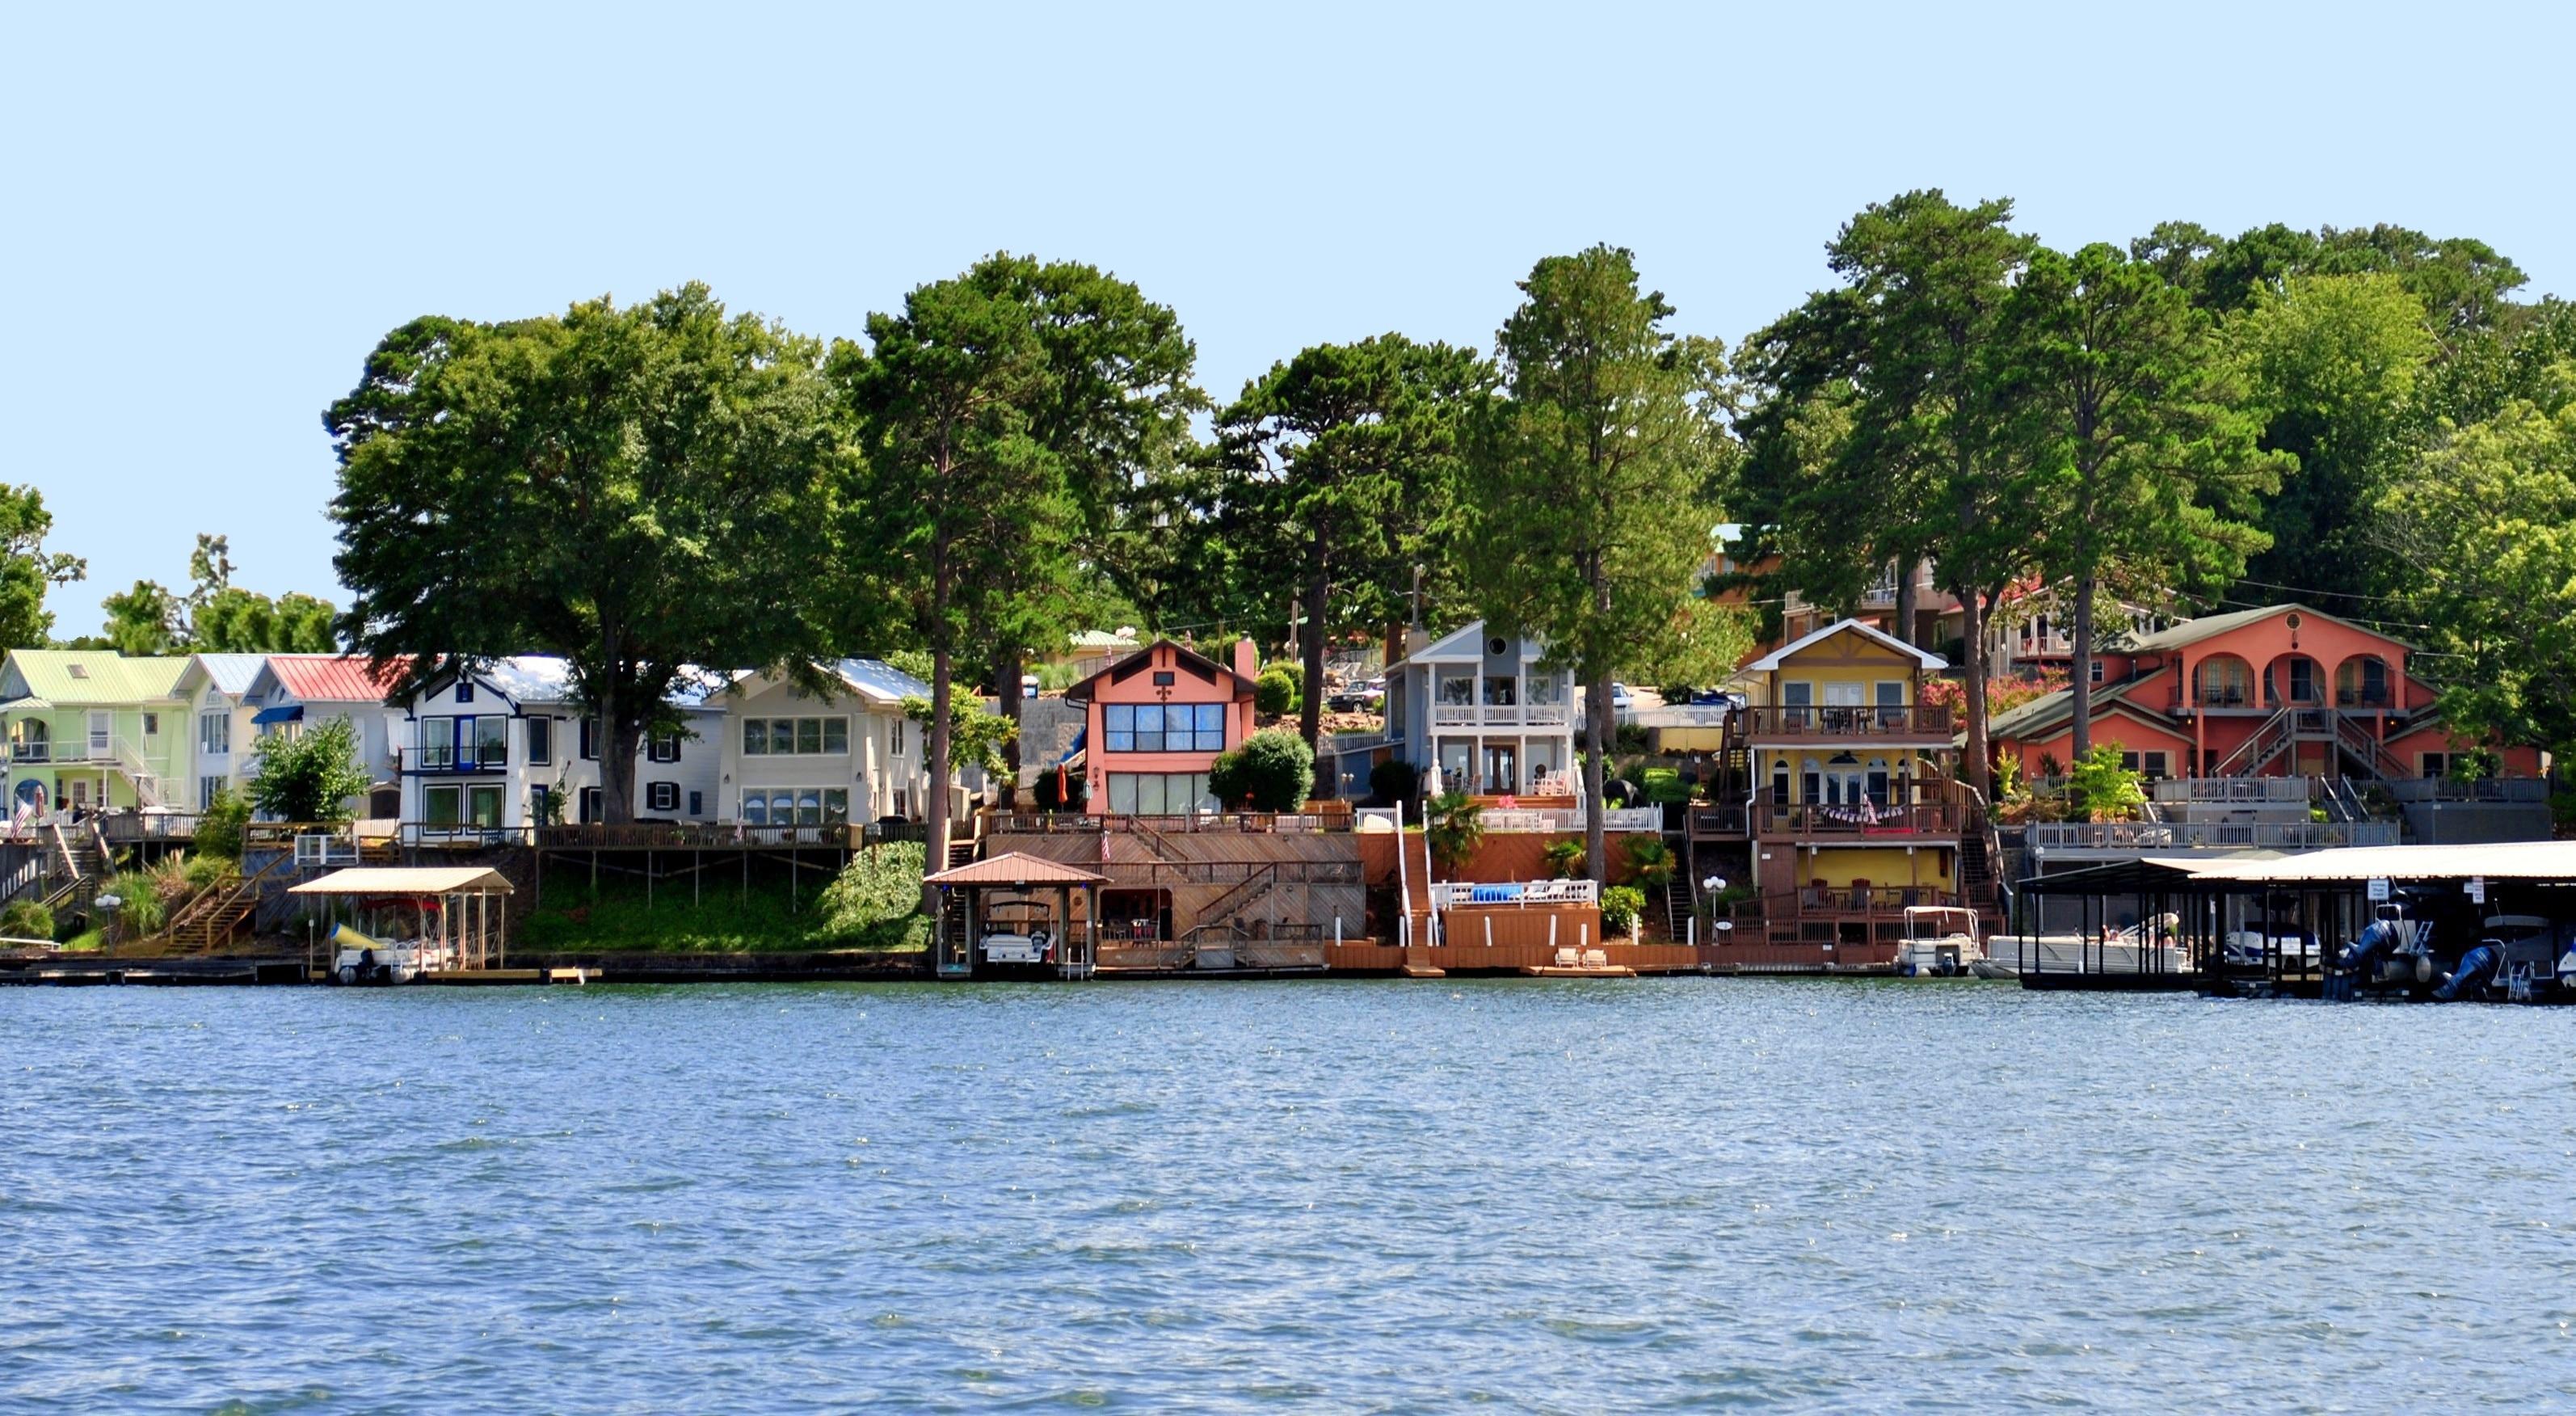 Lake Hamilton, Arkansas, United States of America